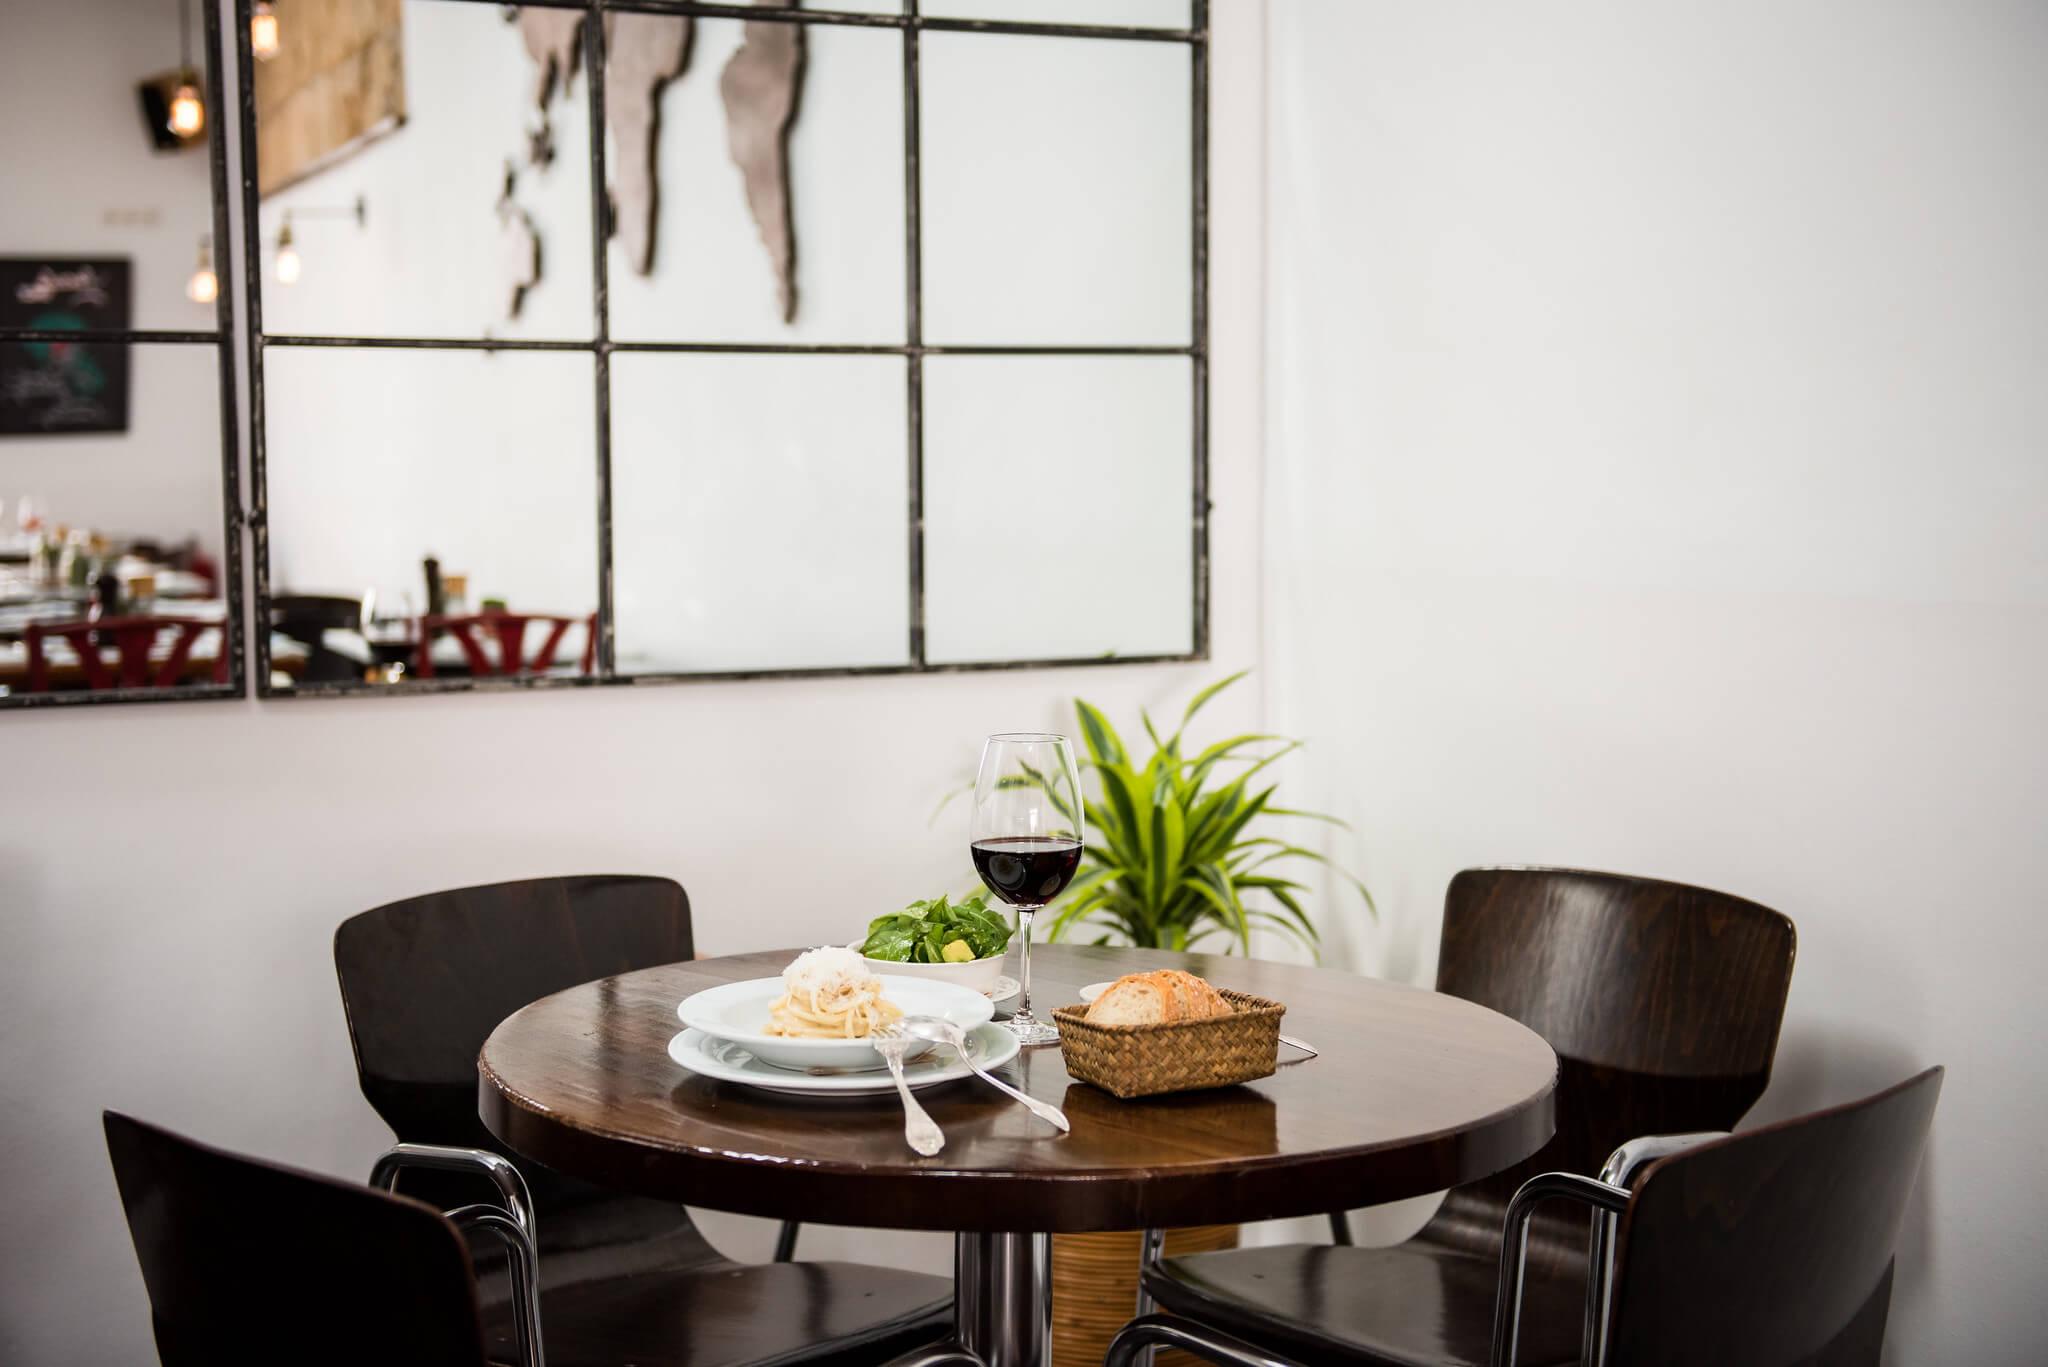 https://www.white-ibiza.com/wp-content/uploads/2020/03/white-ibiza-restaurants-locals-only-2020-12.jpg